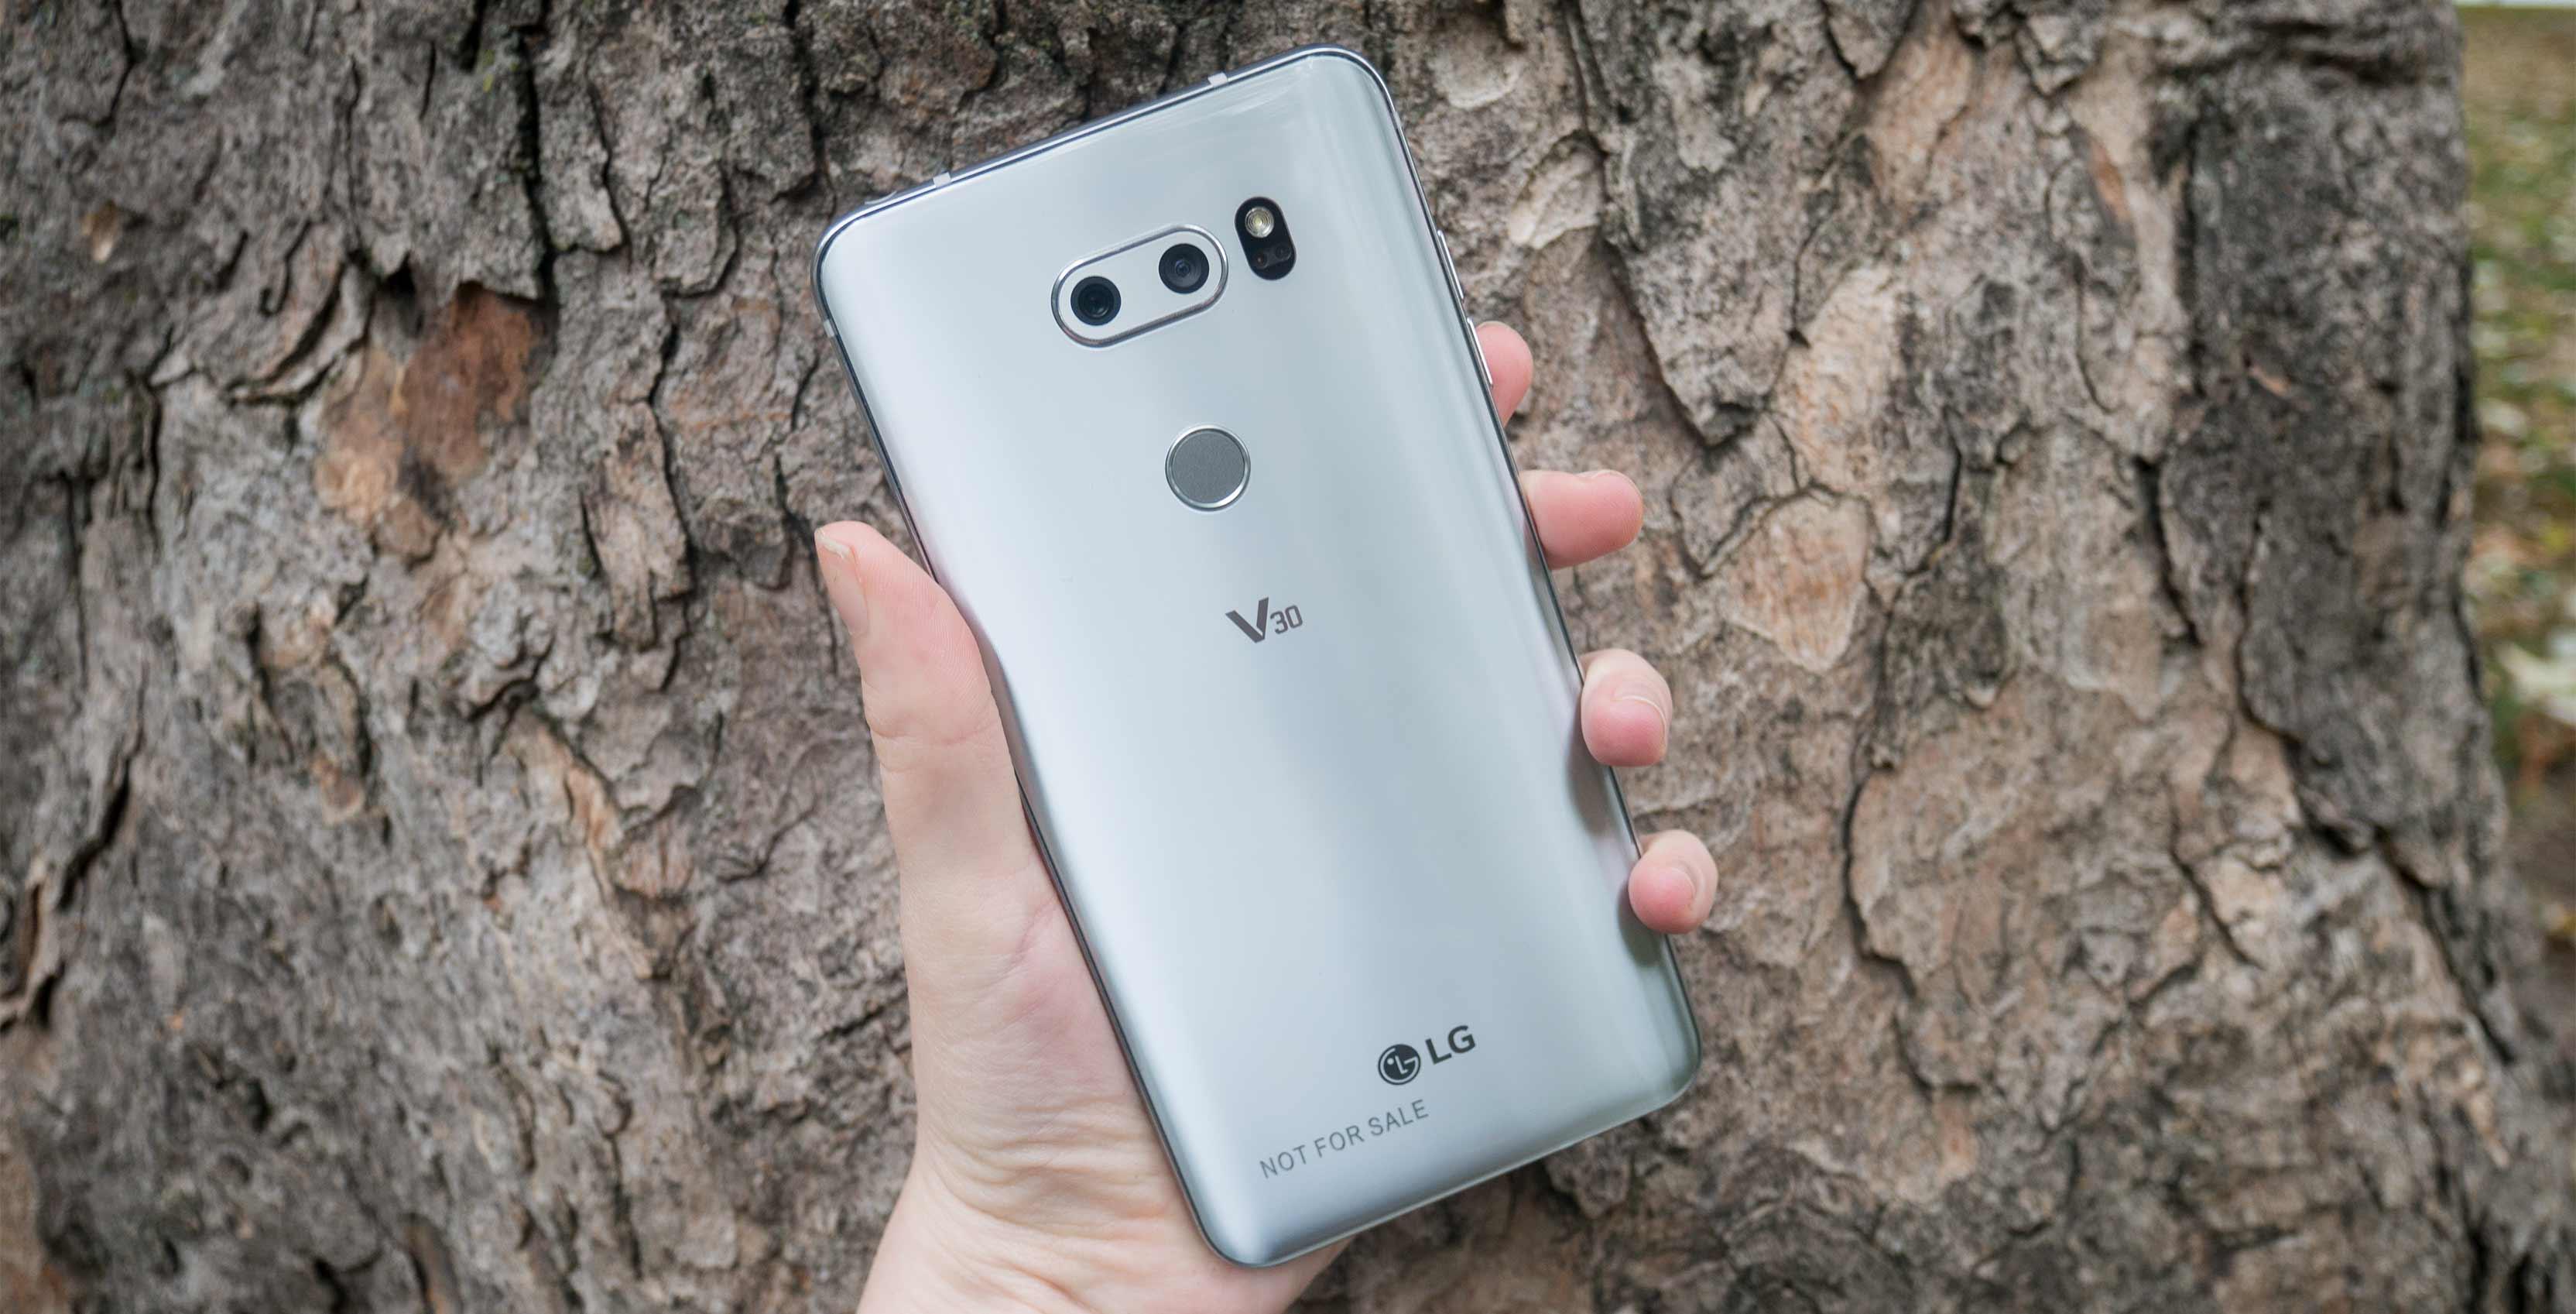 LG V30 Review: A bottomless grab bag of Android treats